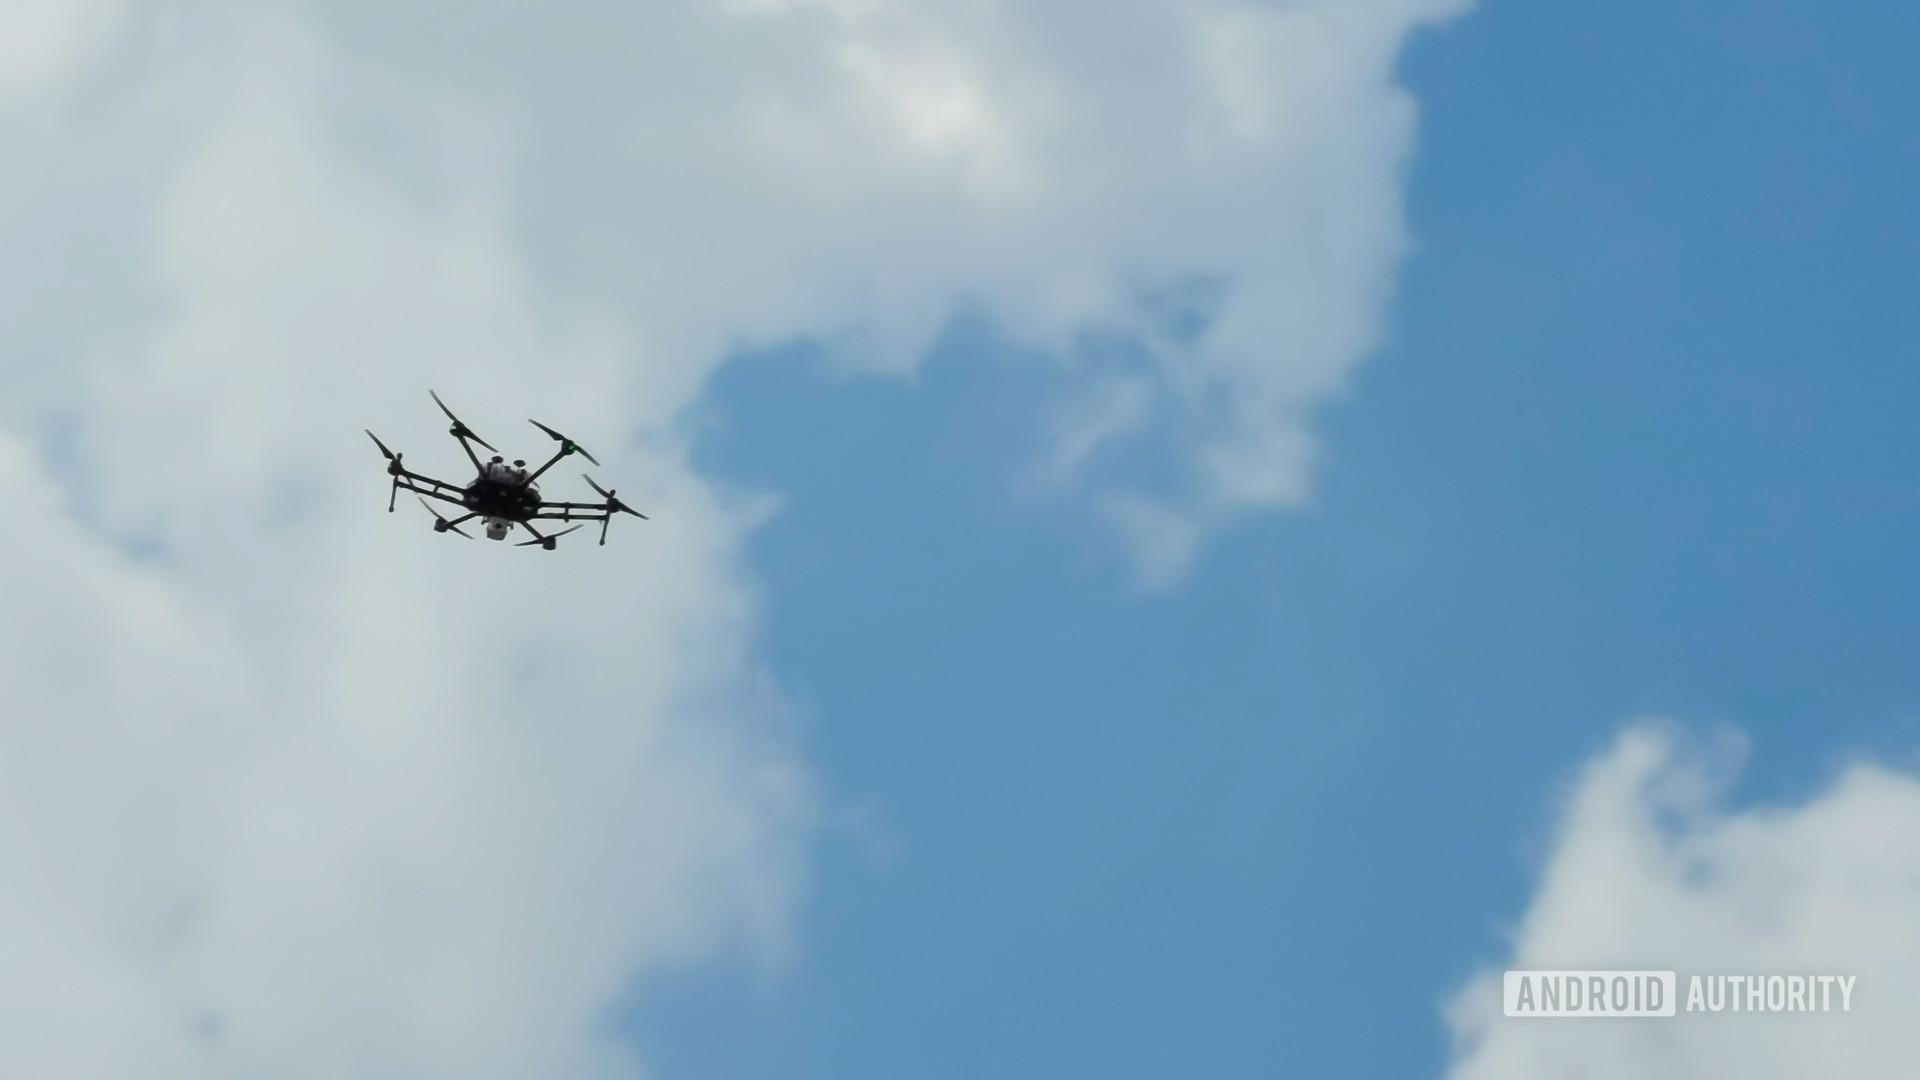 Huawei HQ 5G police drone in flight